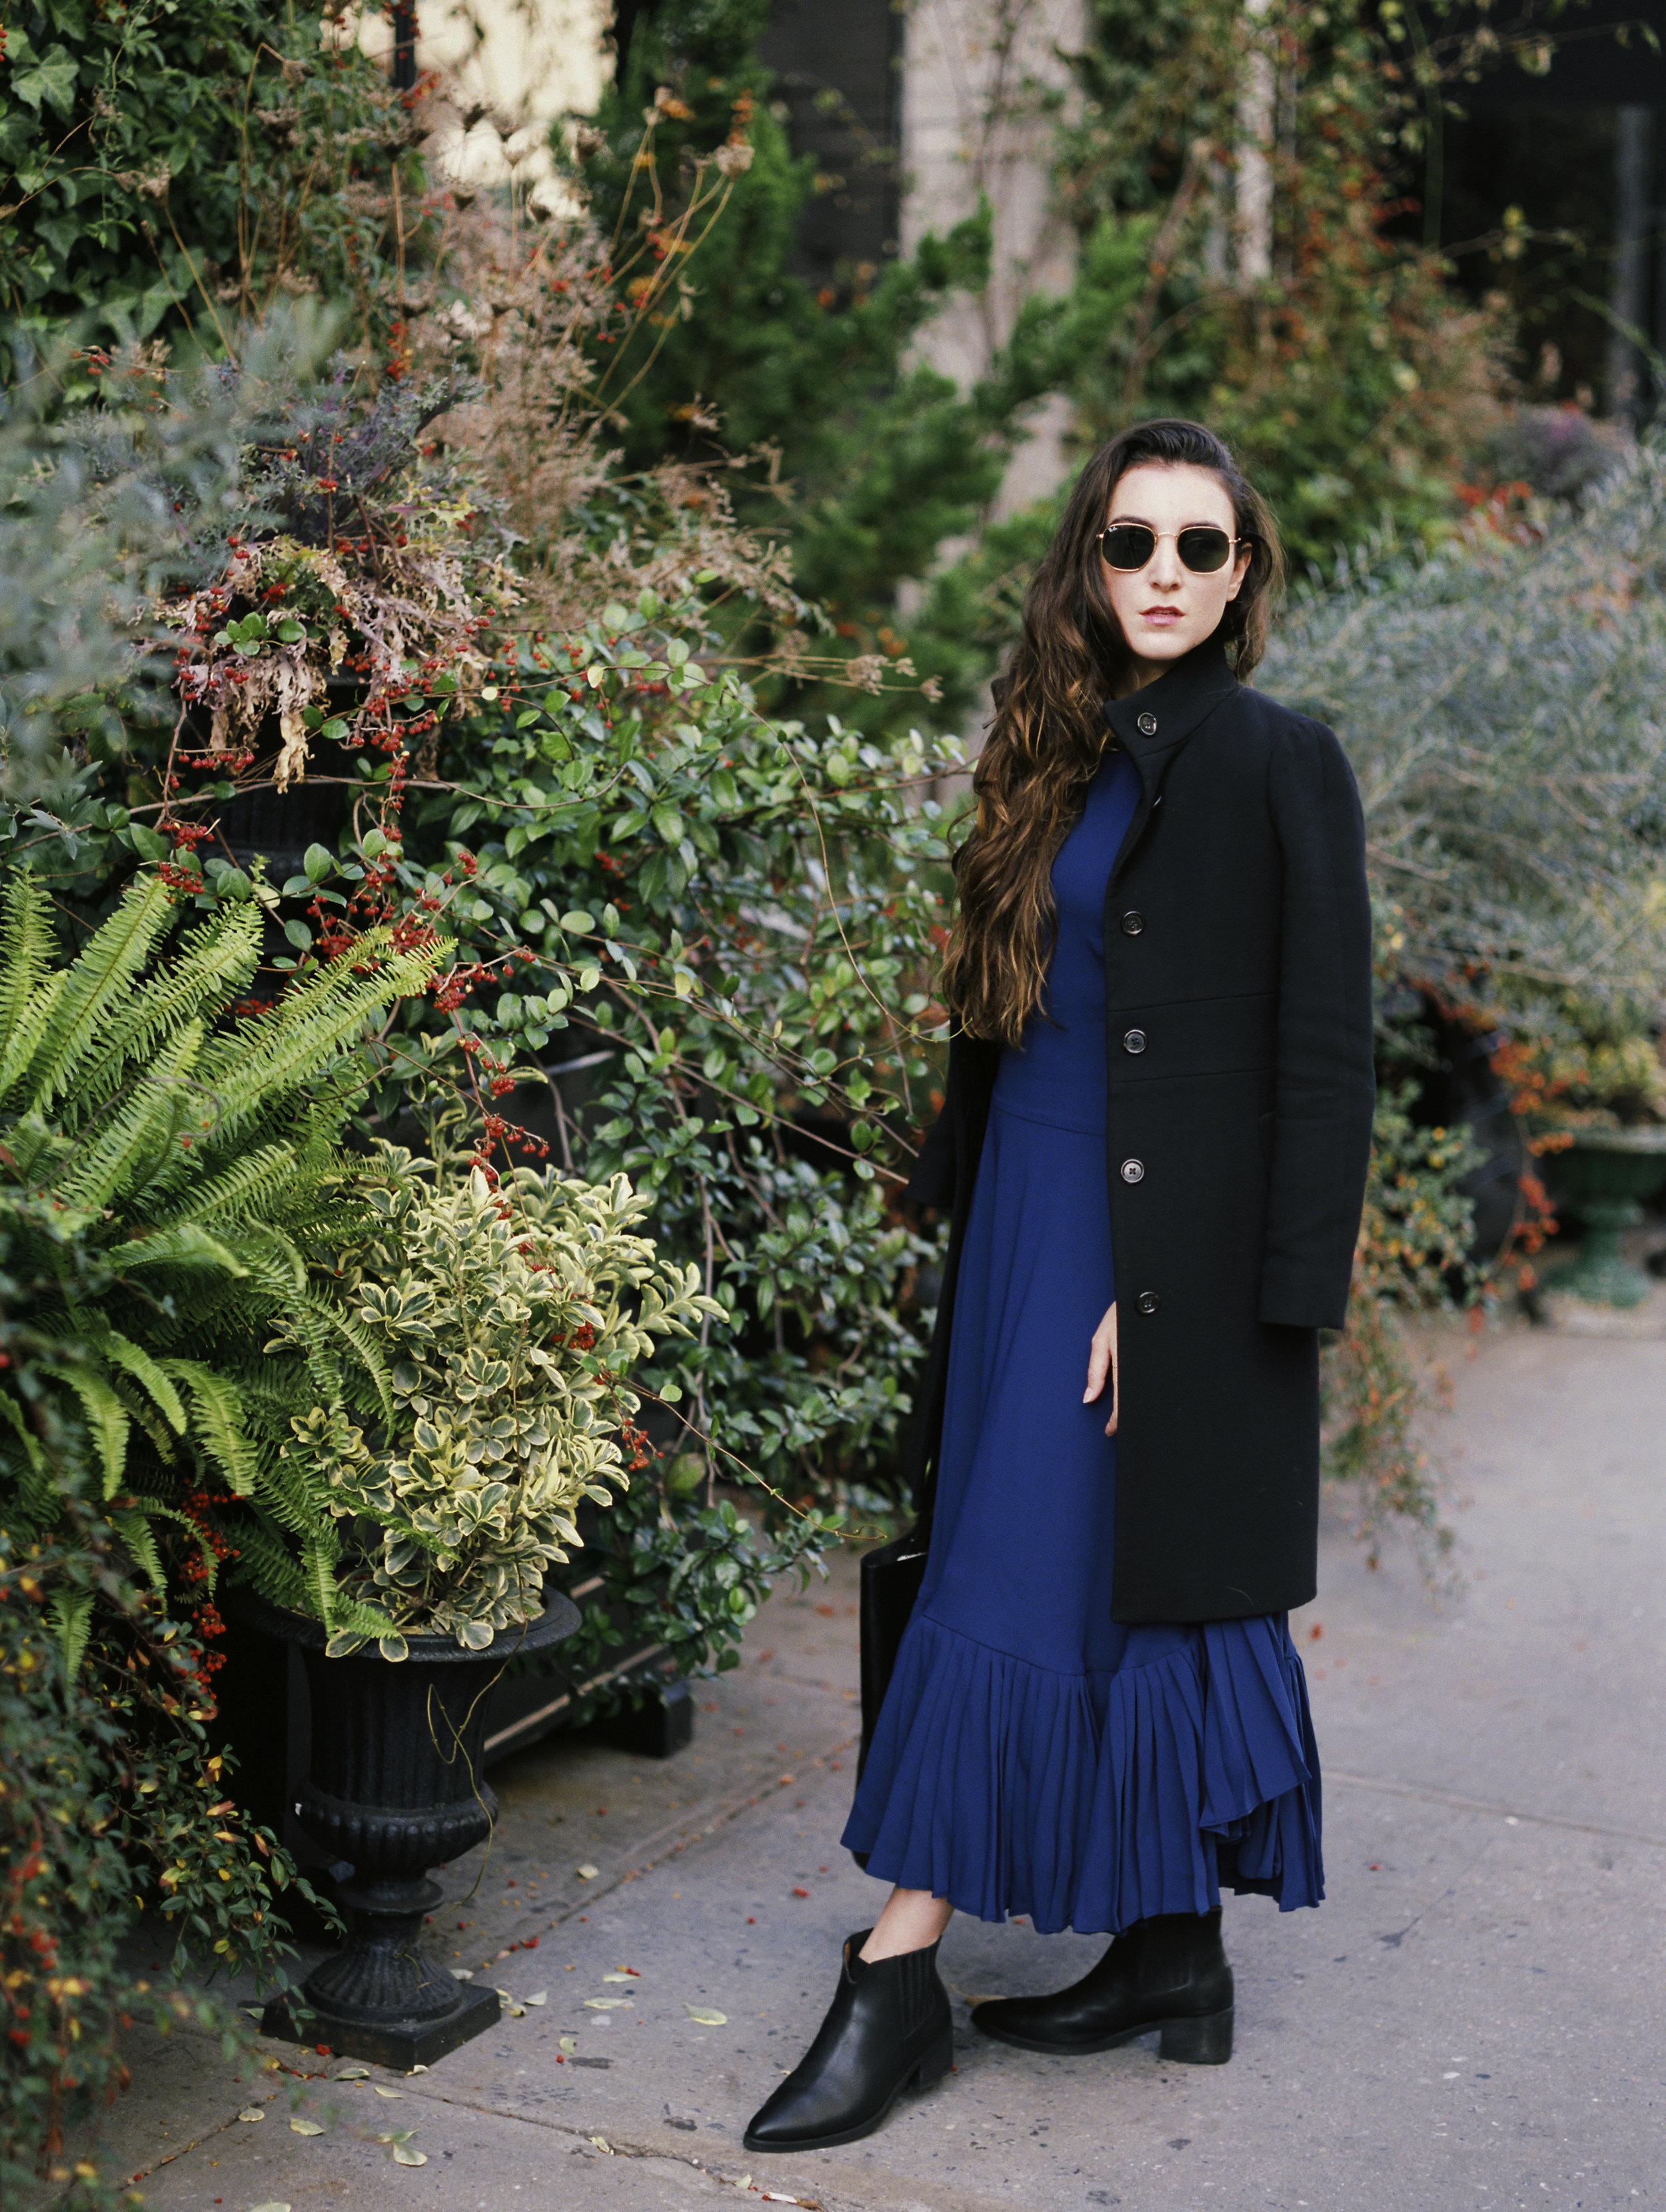 NYC Blue Dress3.jpg